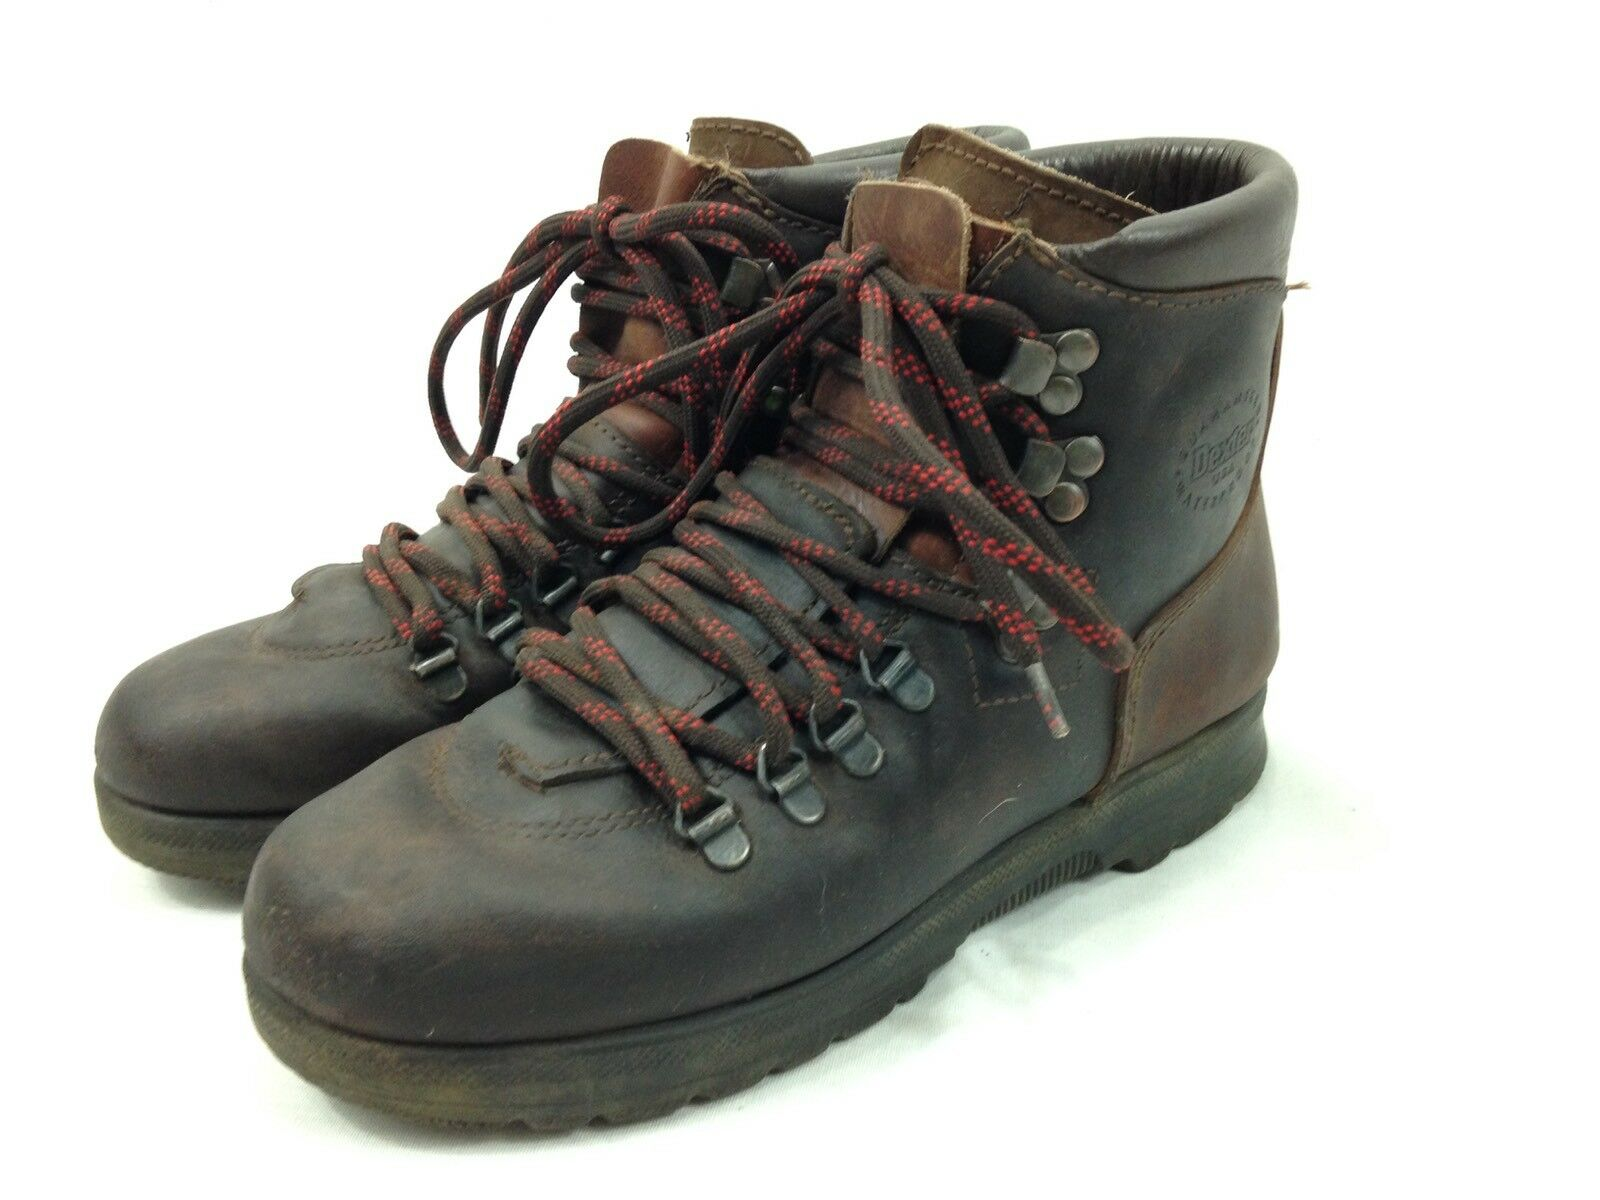 VTG Dexter Hiking Mountaineering Stiefel Damenschuhe 8 M Braun Waterproof Lace Up USA